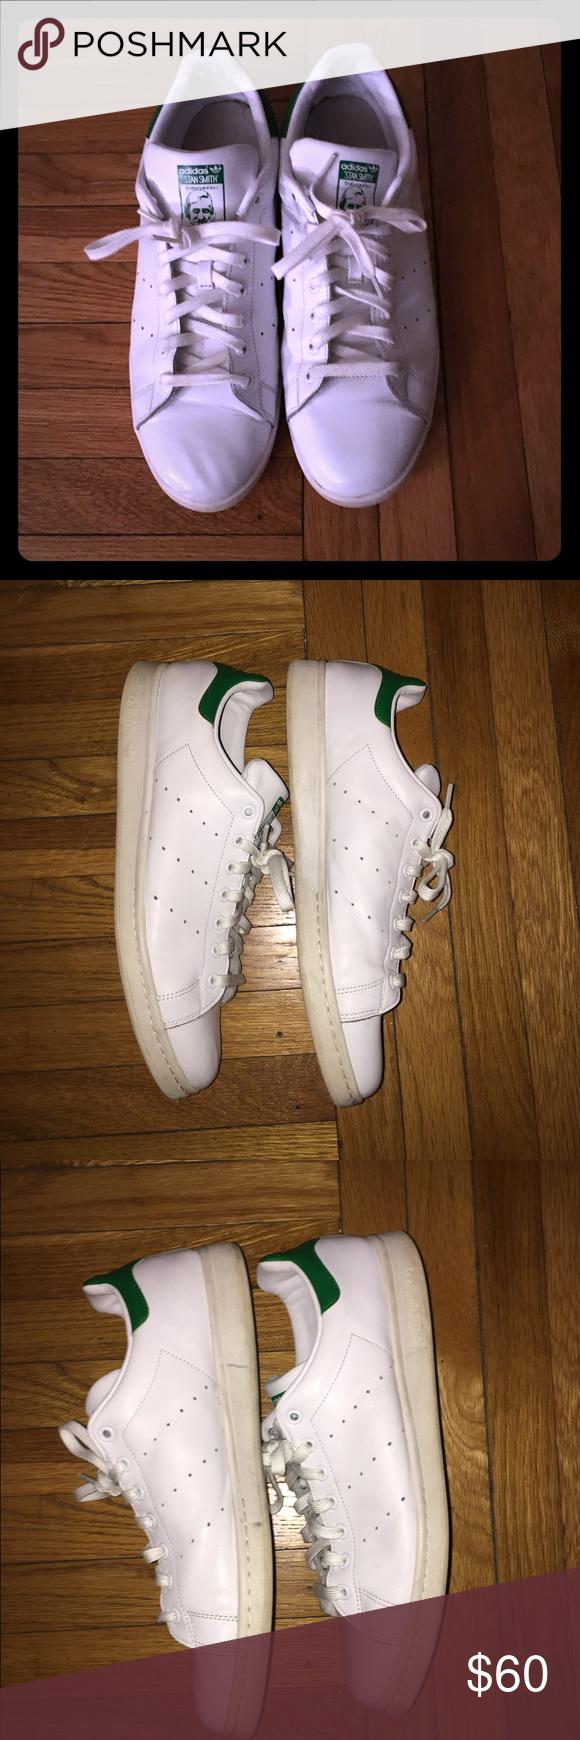 adidas stan smith size 14